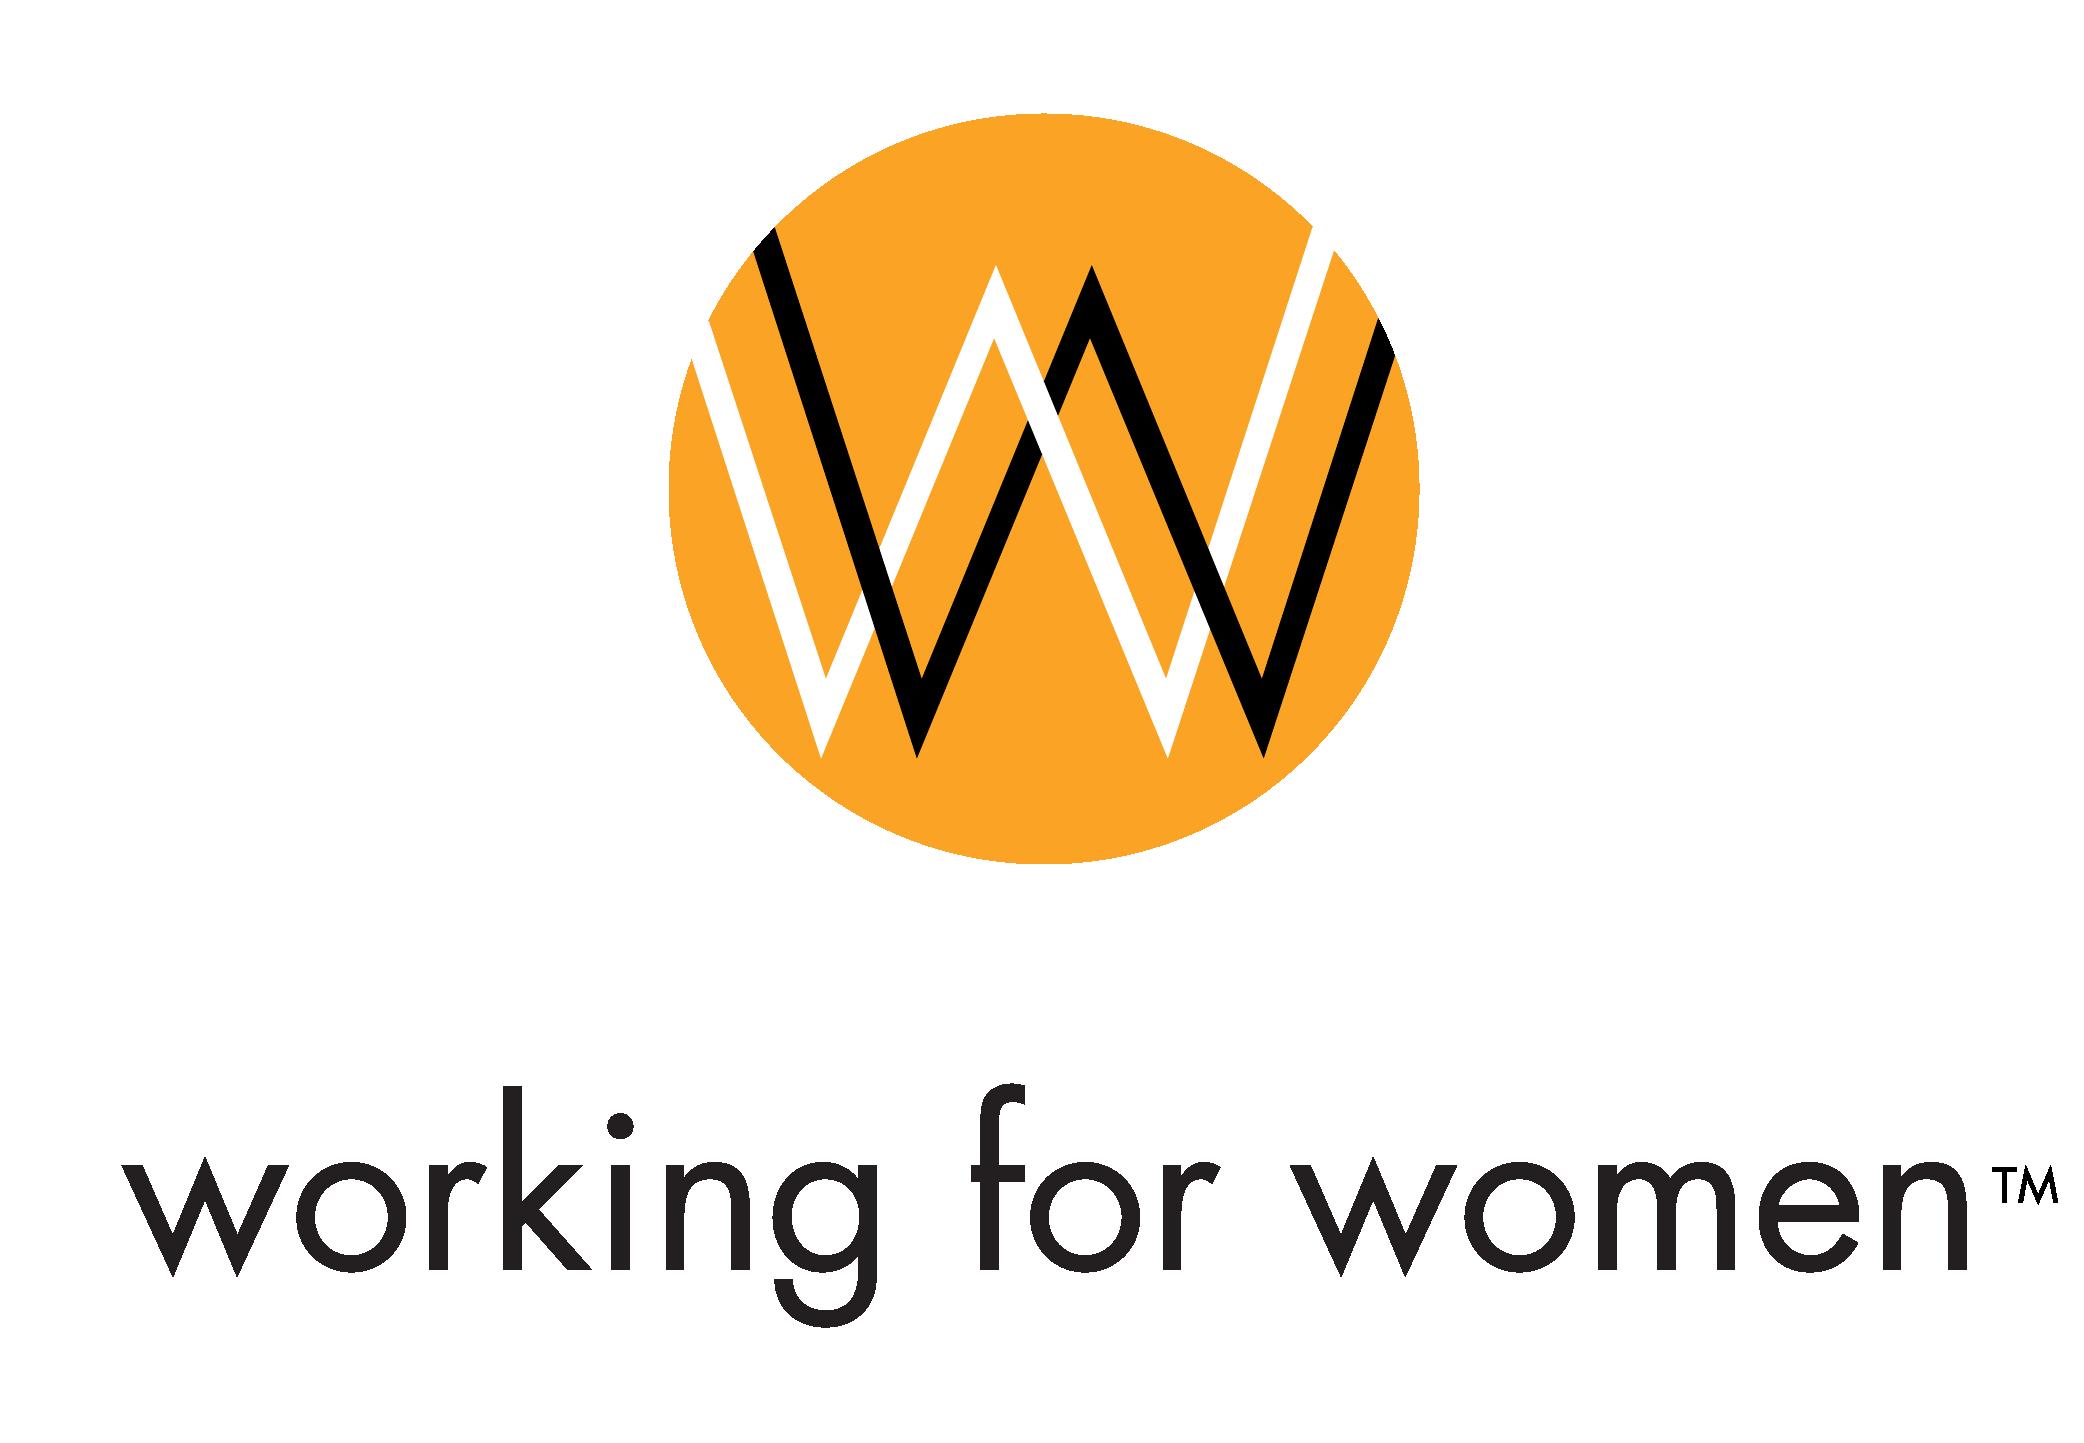 workingforwomen.org